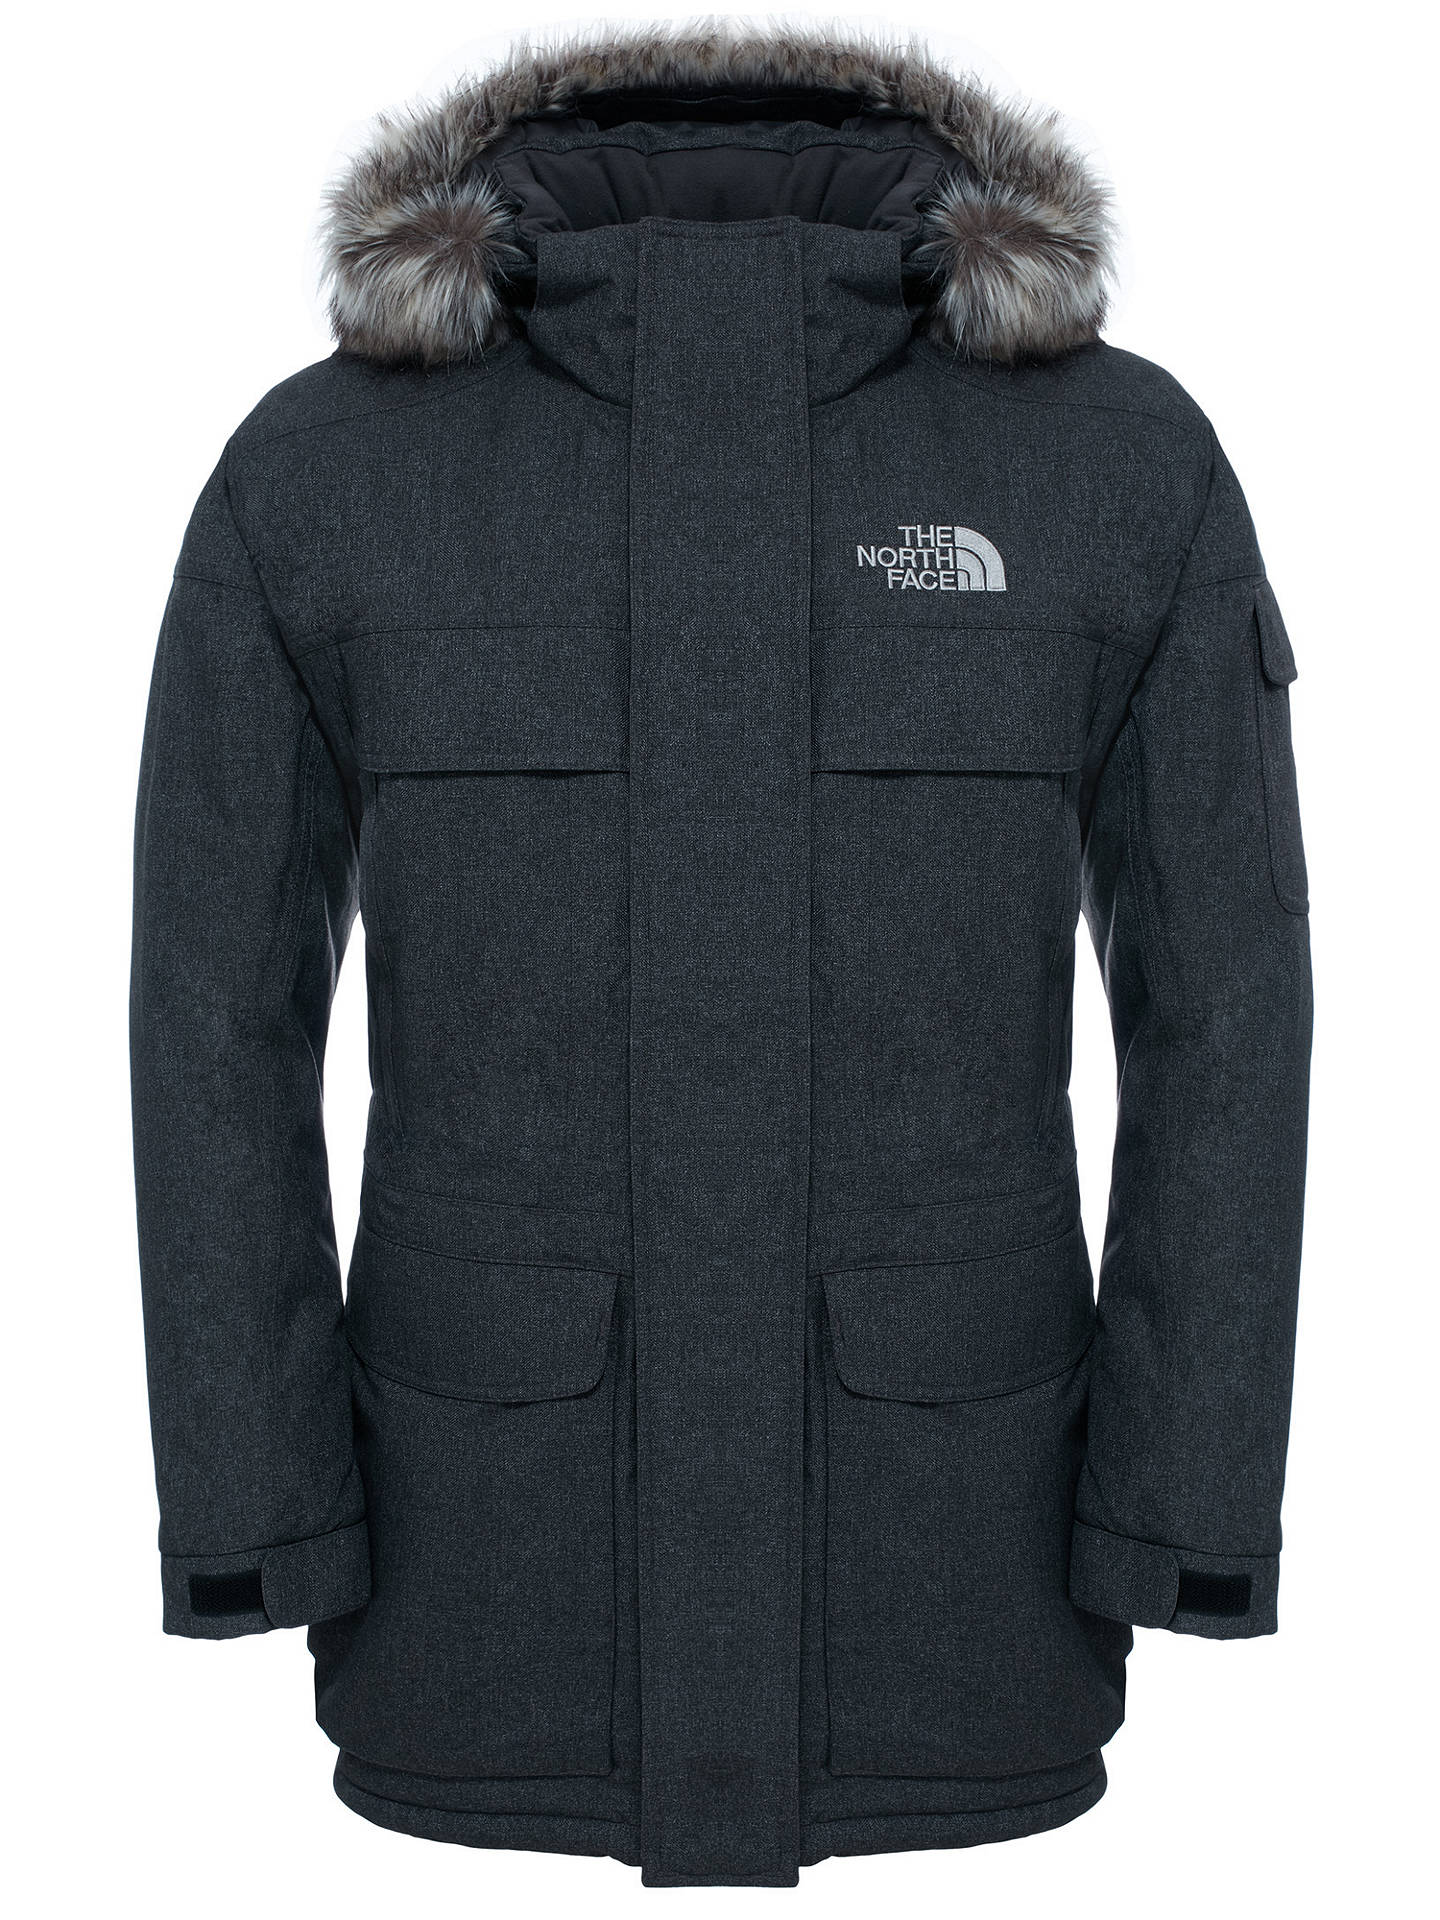 6d56aa6cd The North Face Men's Murdo Waterproof Parka Jacket, Grey at John ...